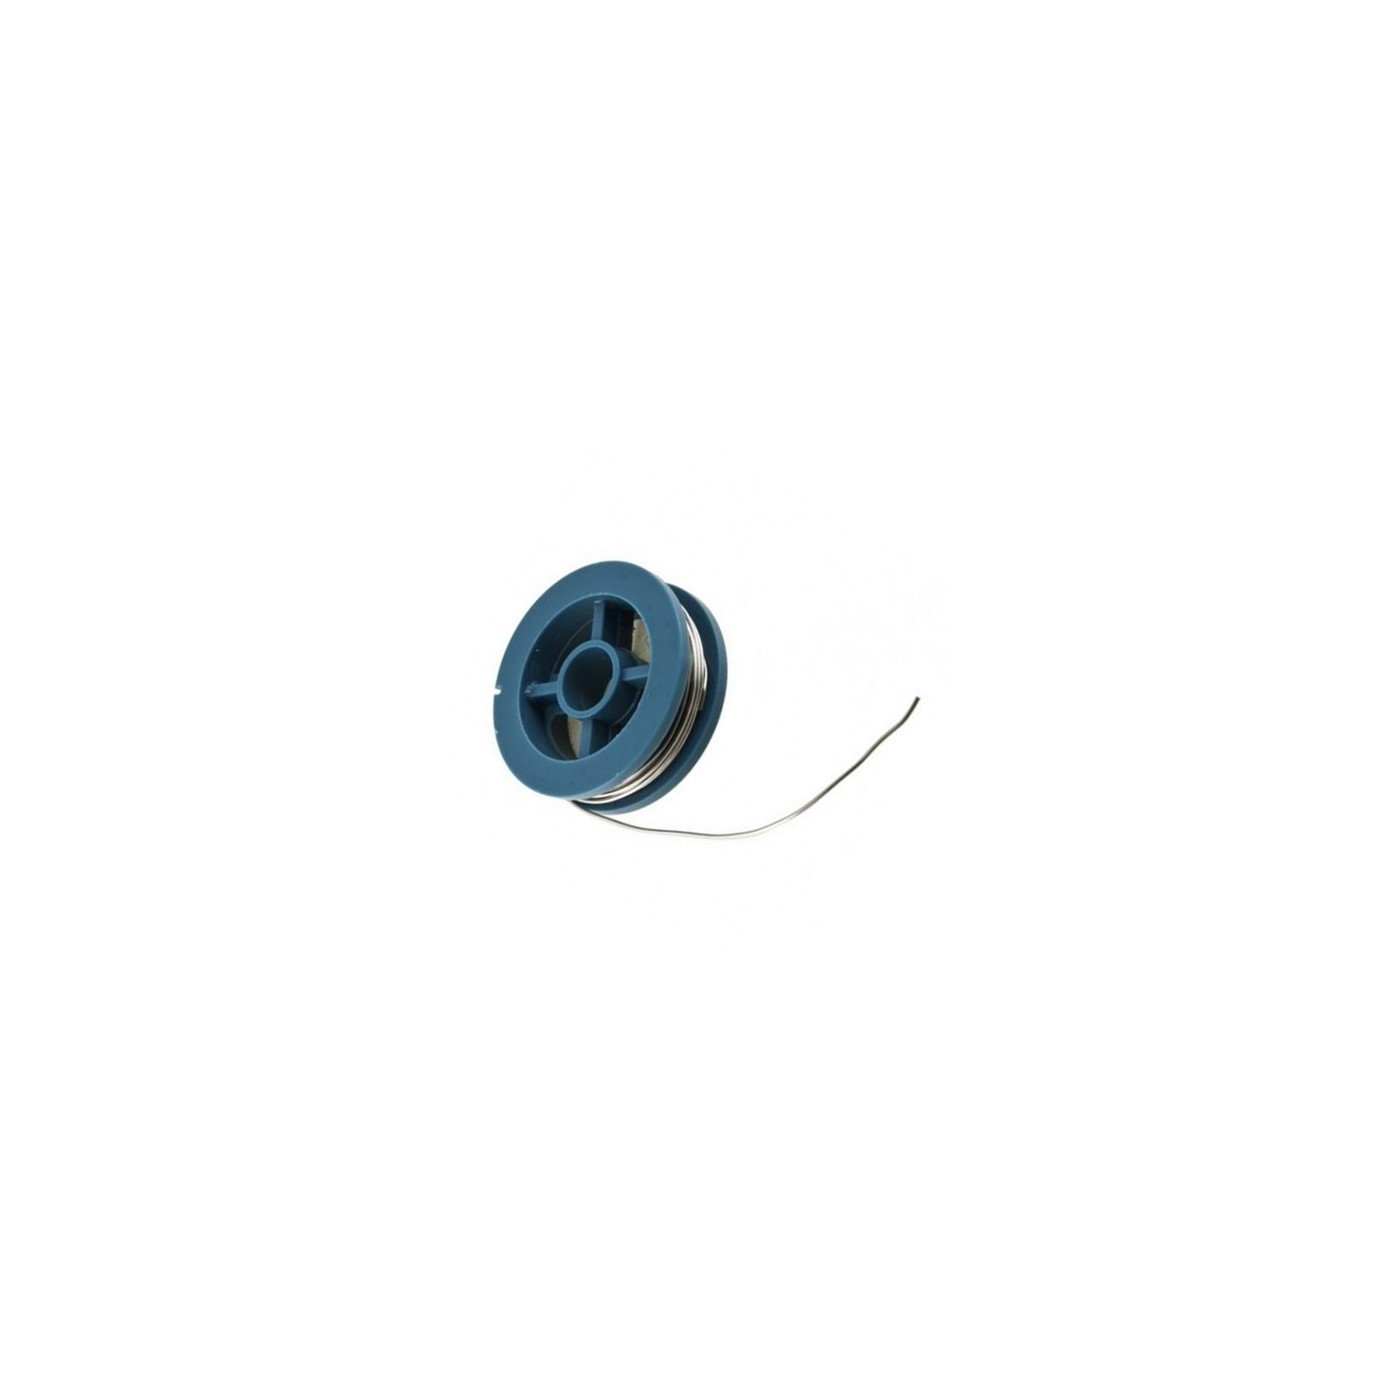 Soldeertin 0.8 mm, kleine rol